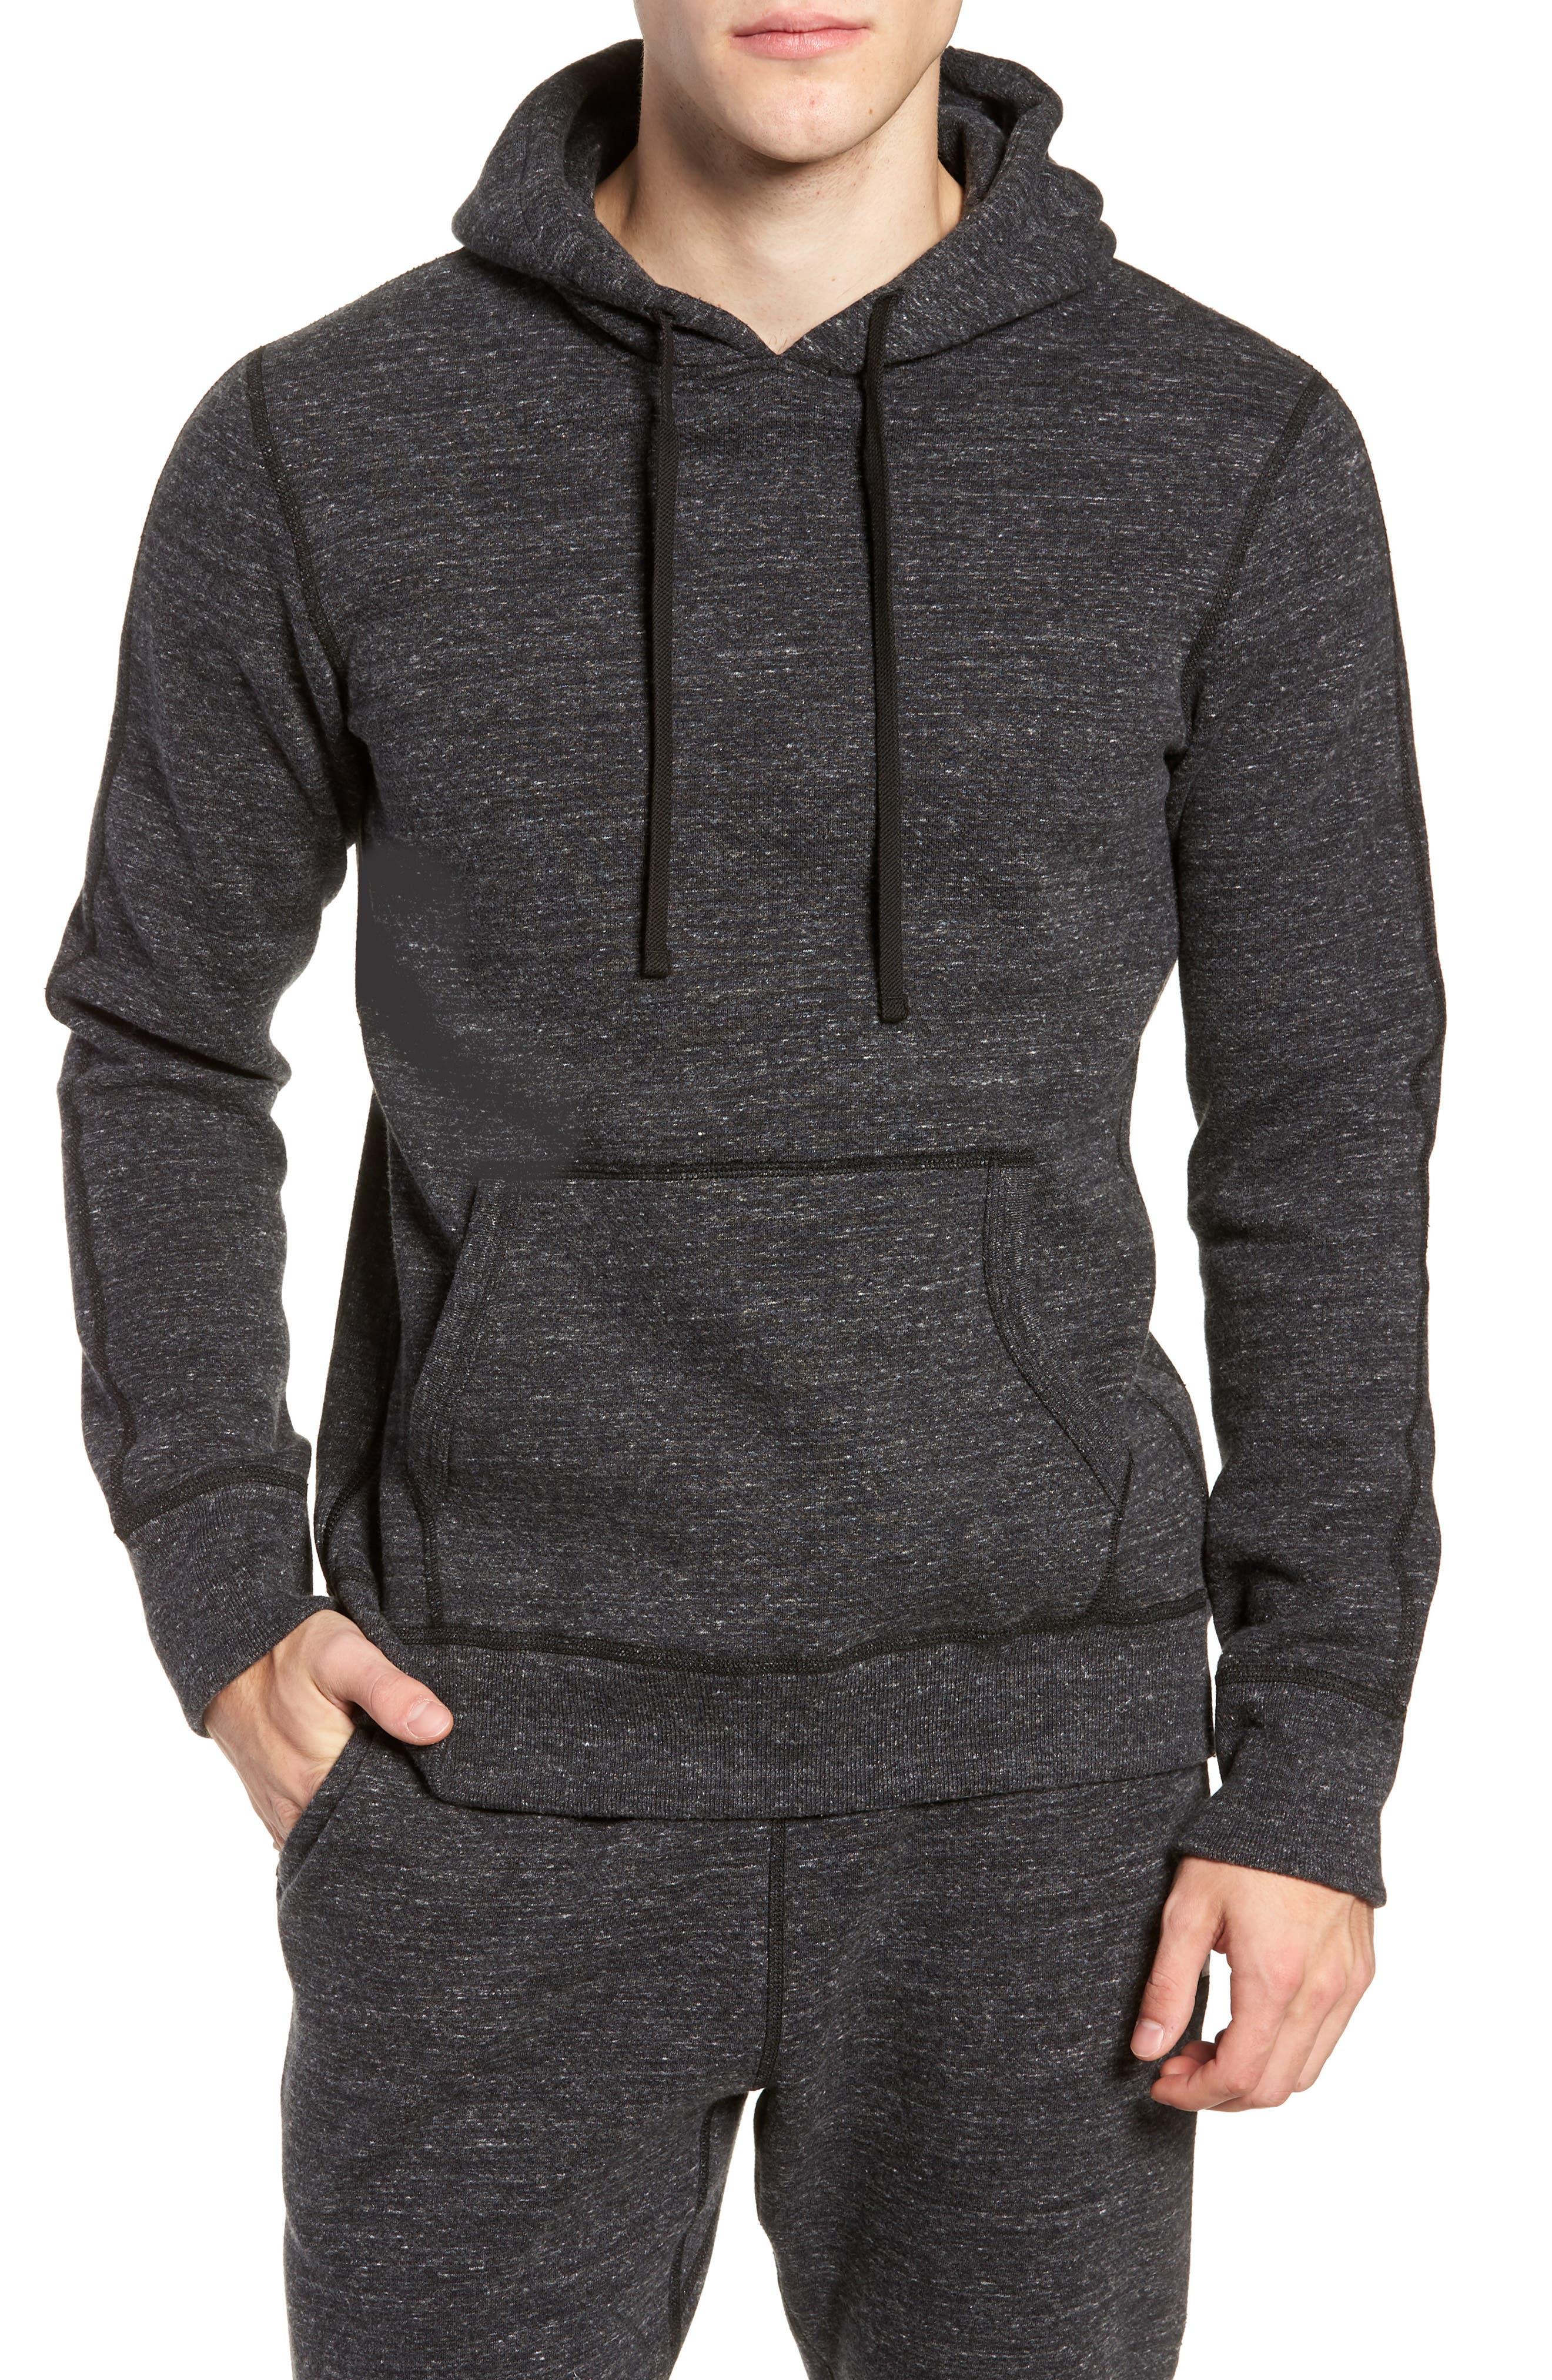 Trim Fit Side Zip Hooded Sweatshirt,                             Main thumbnail 1, color,                             020